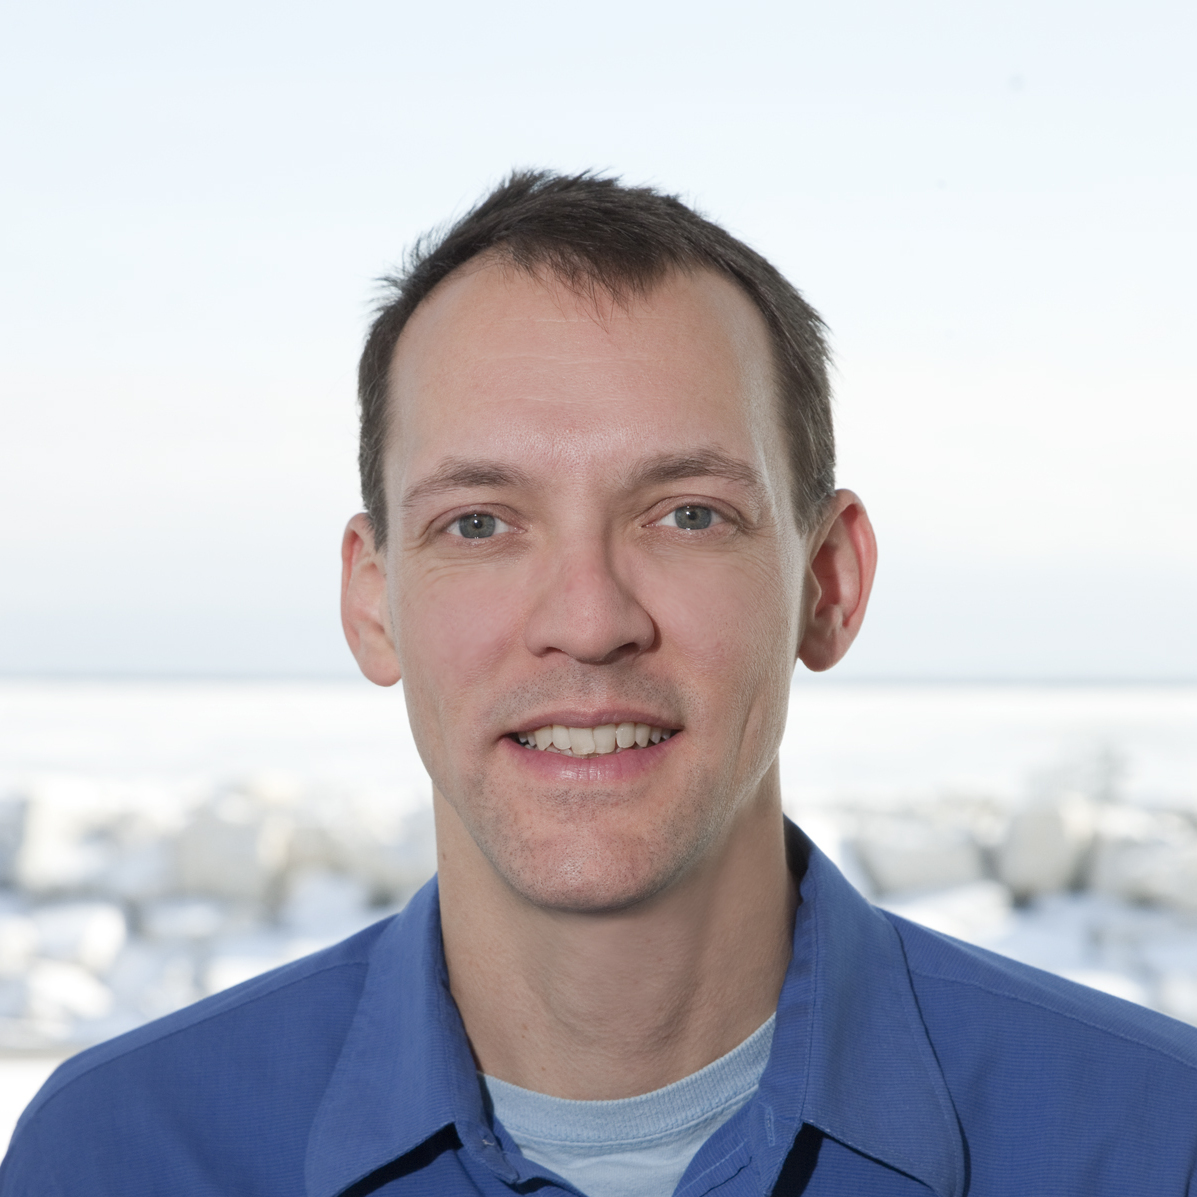 Matthew Konkel